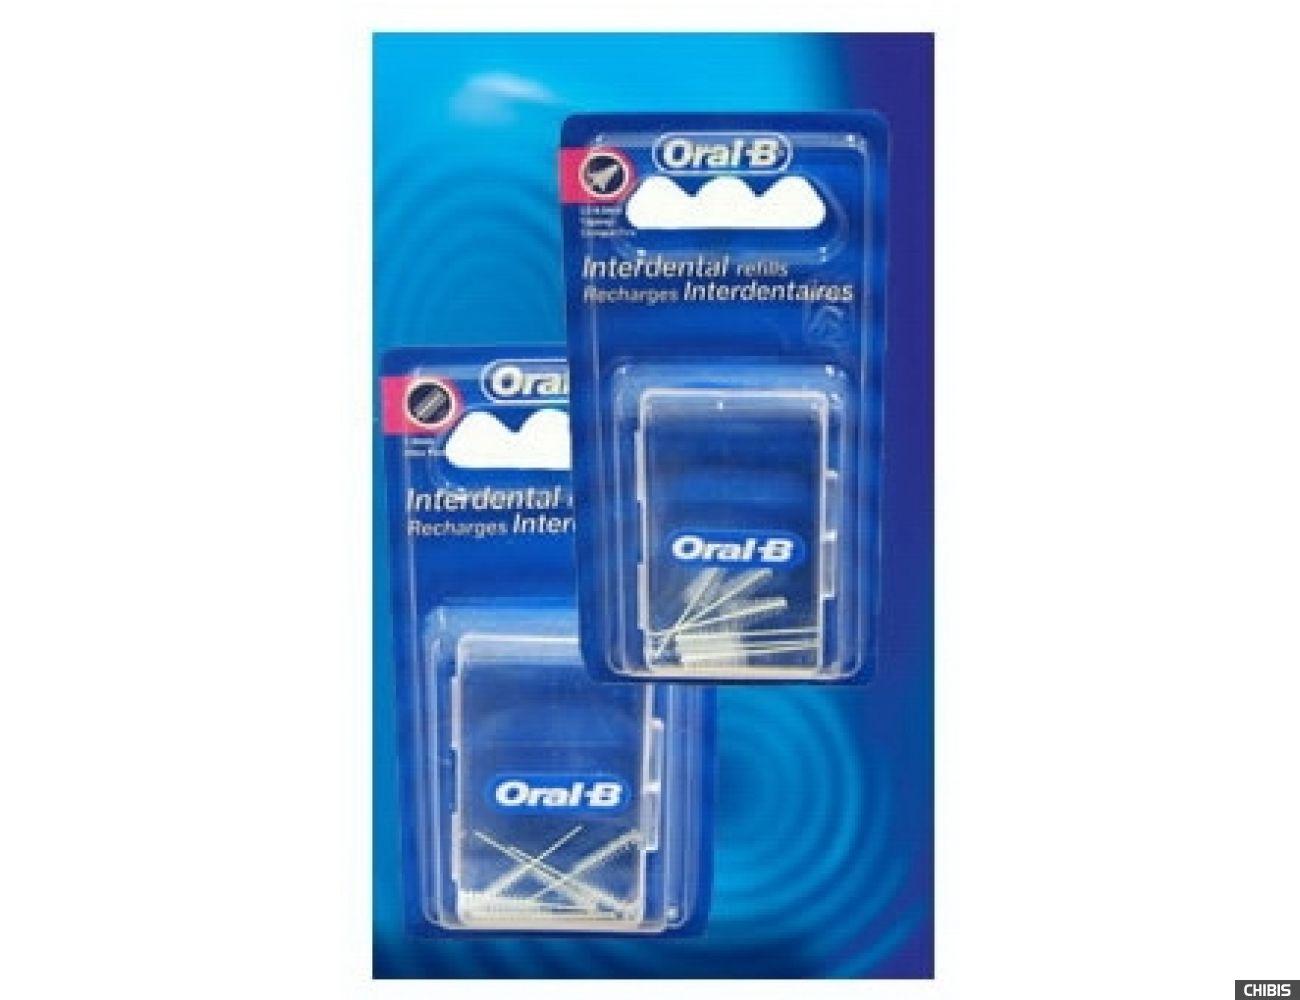 Сменная насадка Oral-B для межзубной щетки Interdental Refills Цилиндр 6 шт (3014260782870)